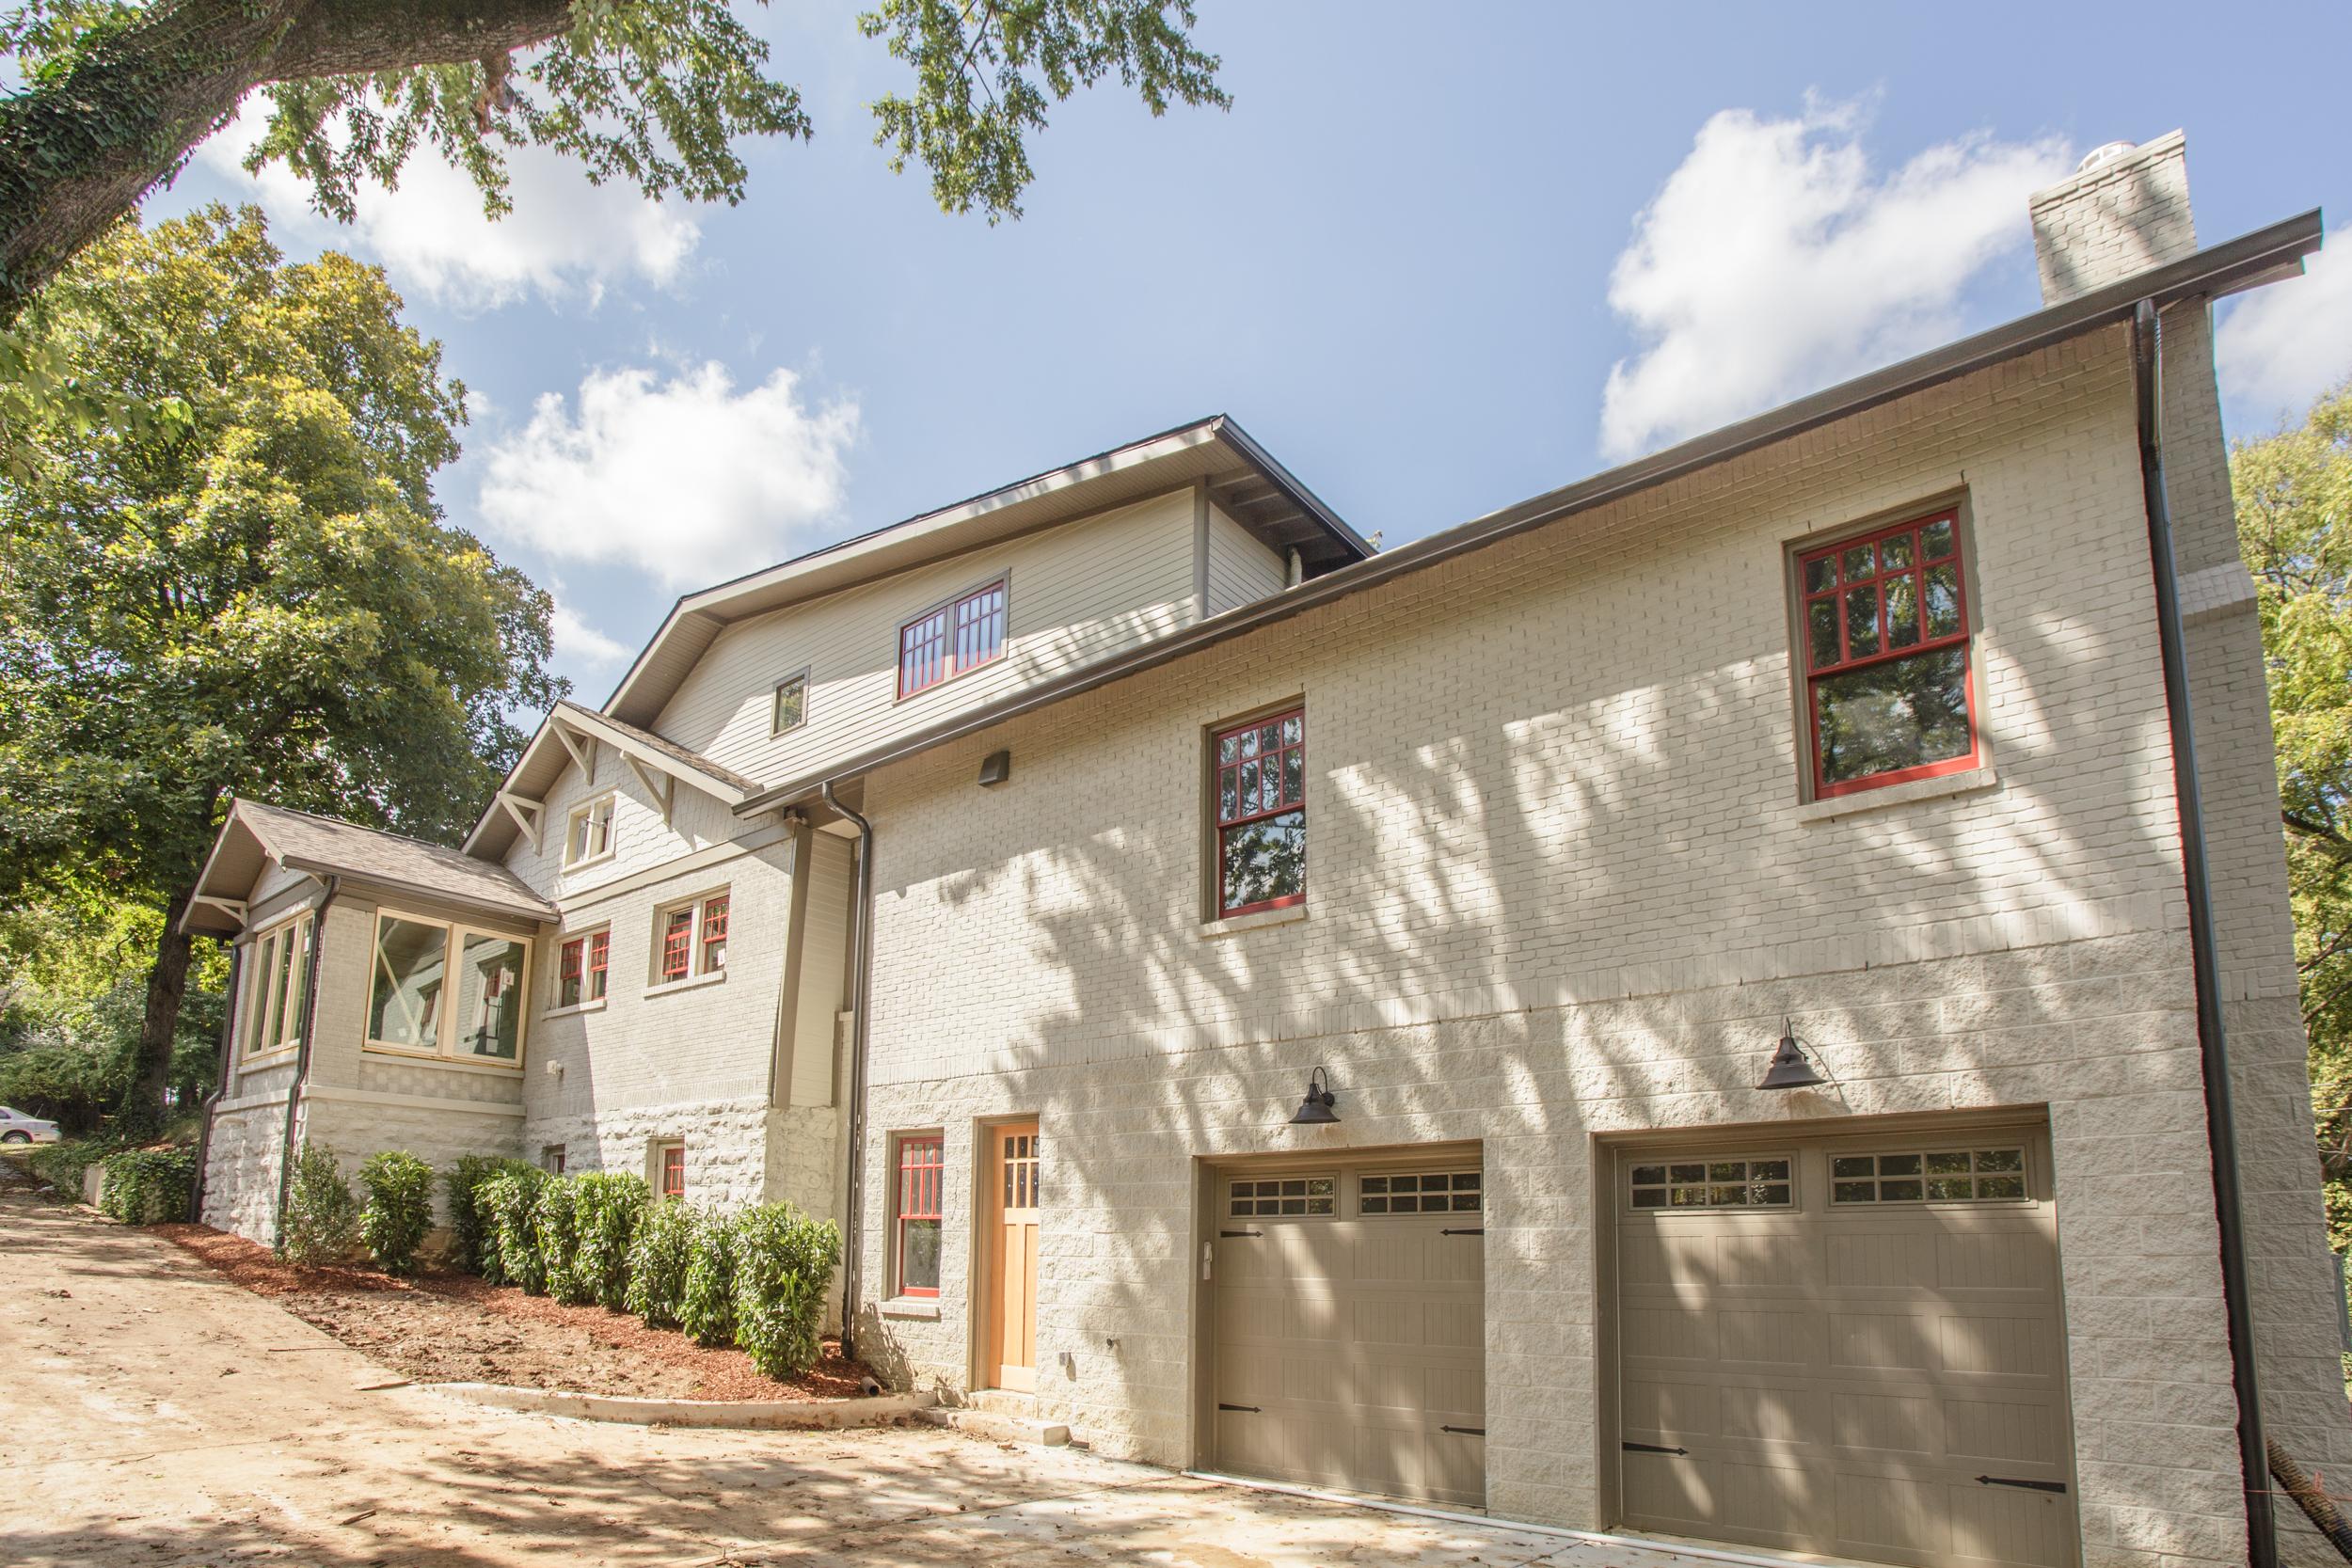 best-home-builder-nashville-renovation-historic-neighborhoods-britt-development-group-0218.jpg